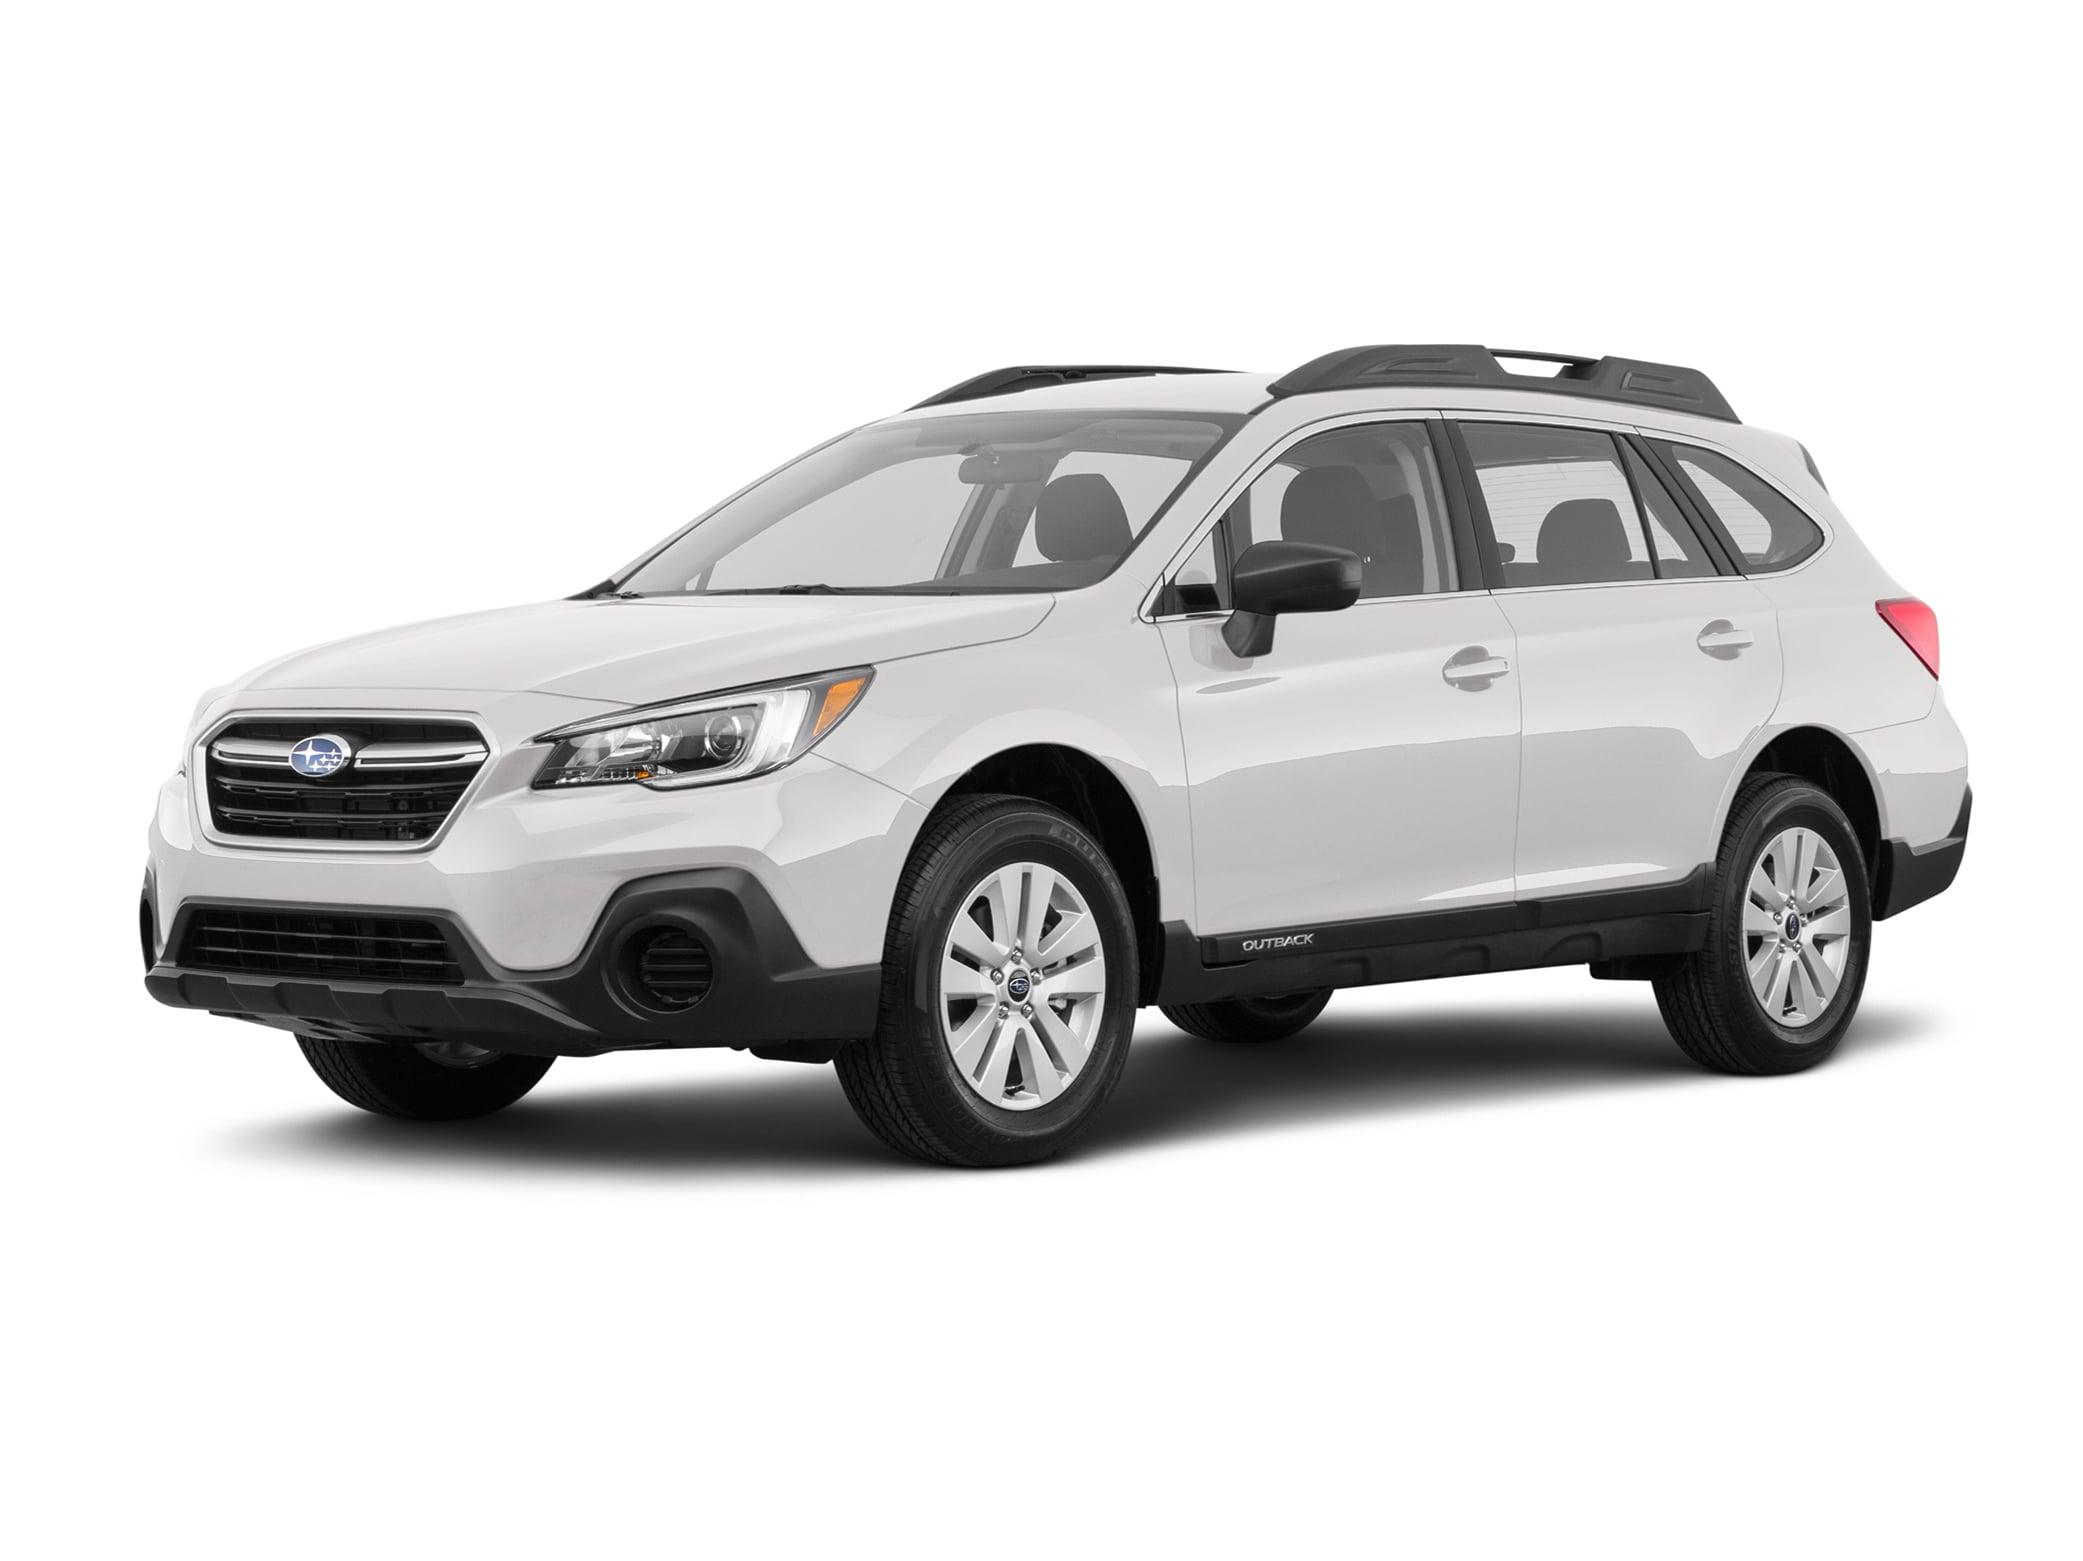 2019 Subaru Outback SUV in Burnsville Minneapolis Area